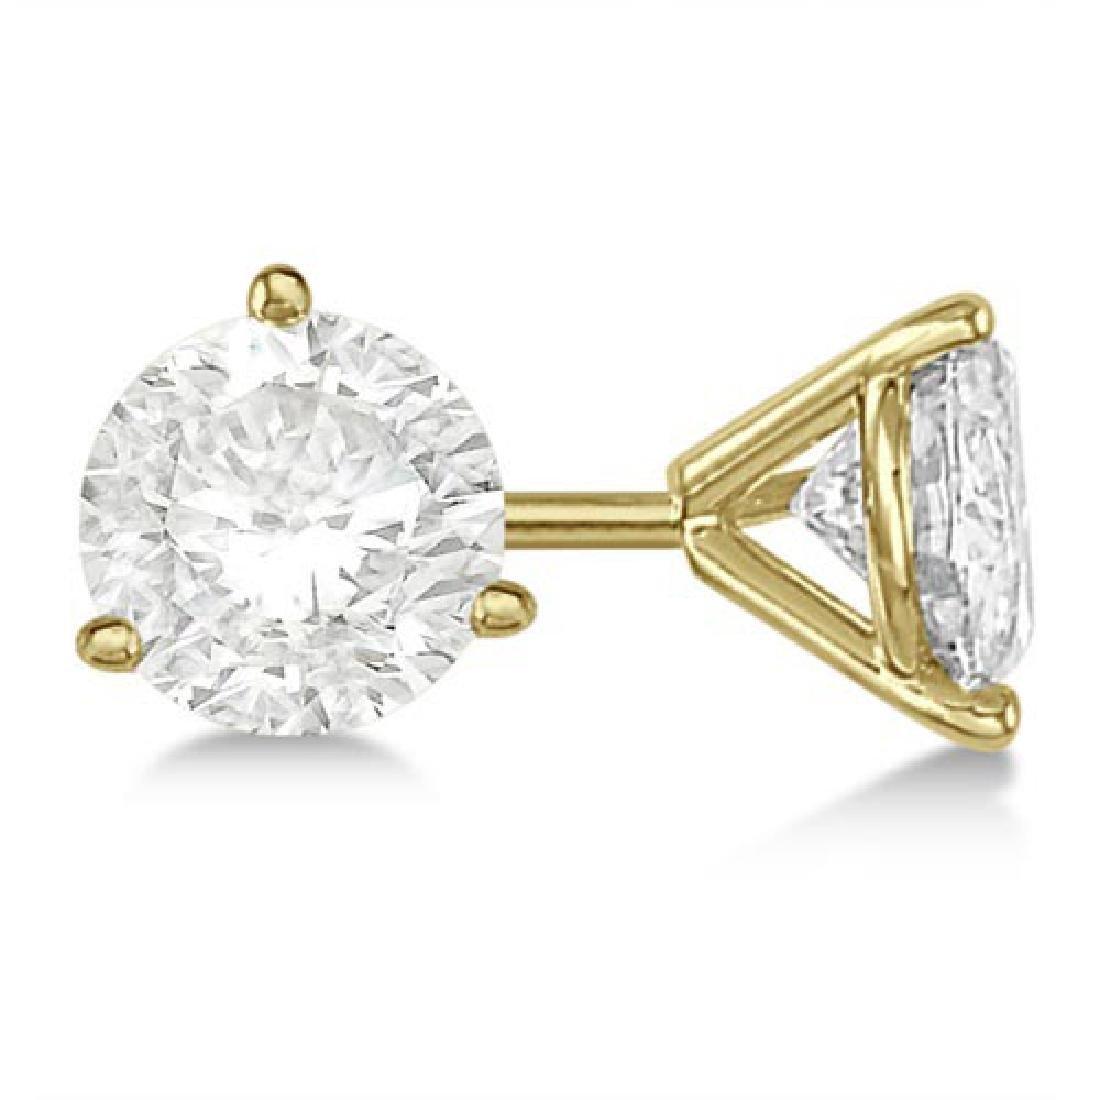 2.00ct. 3-Prong Martini Diamond Stud Earrings 18kt Yell